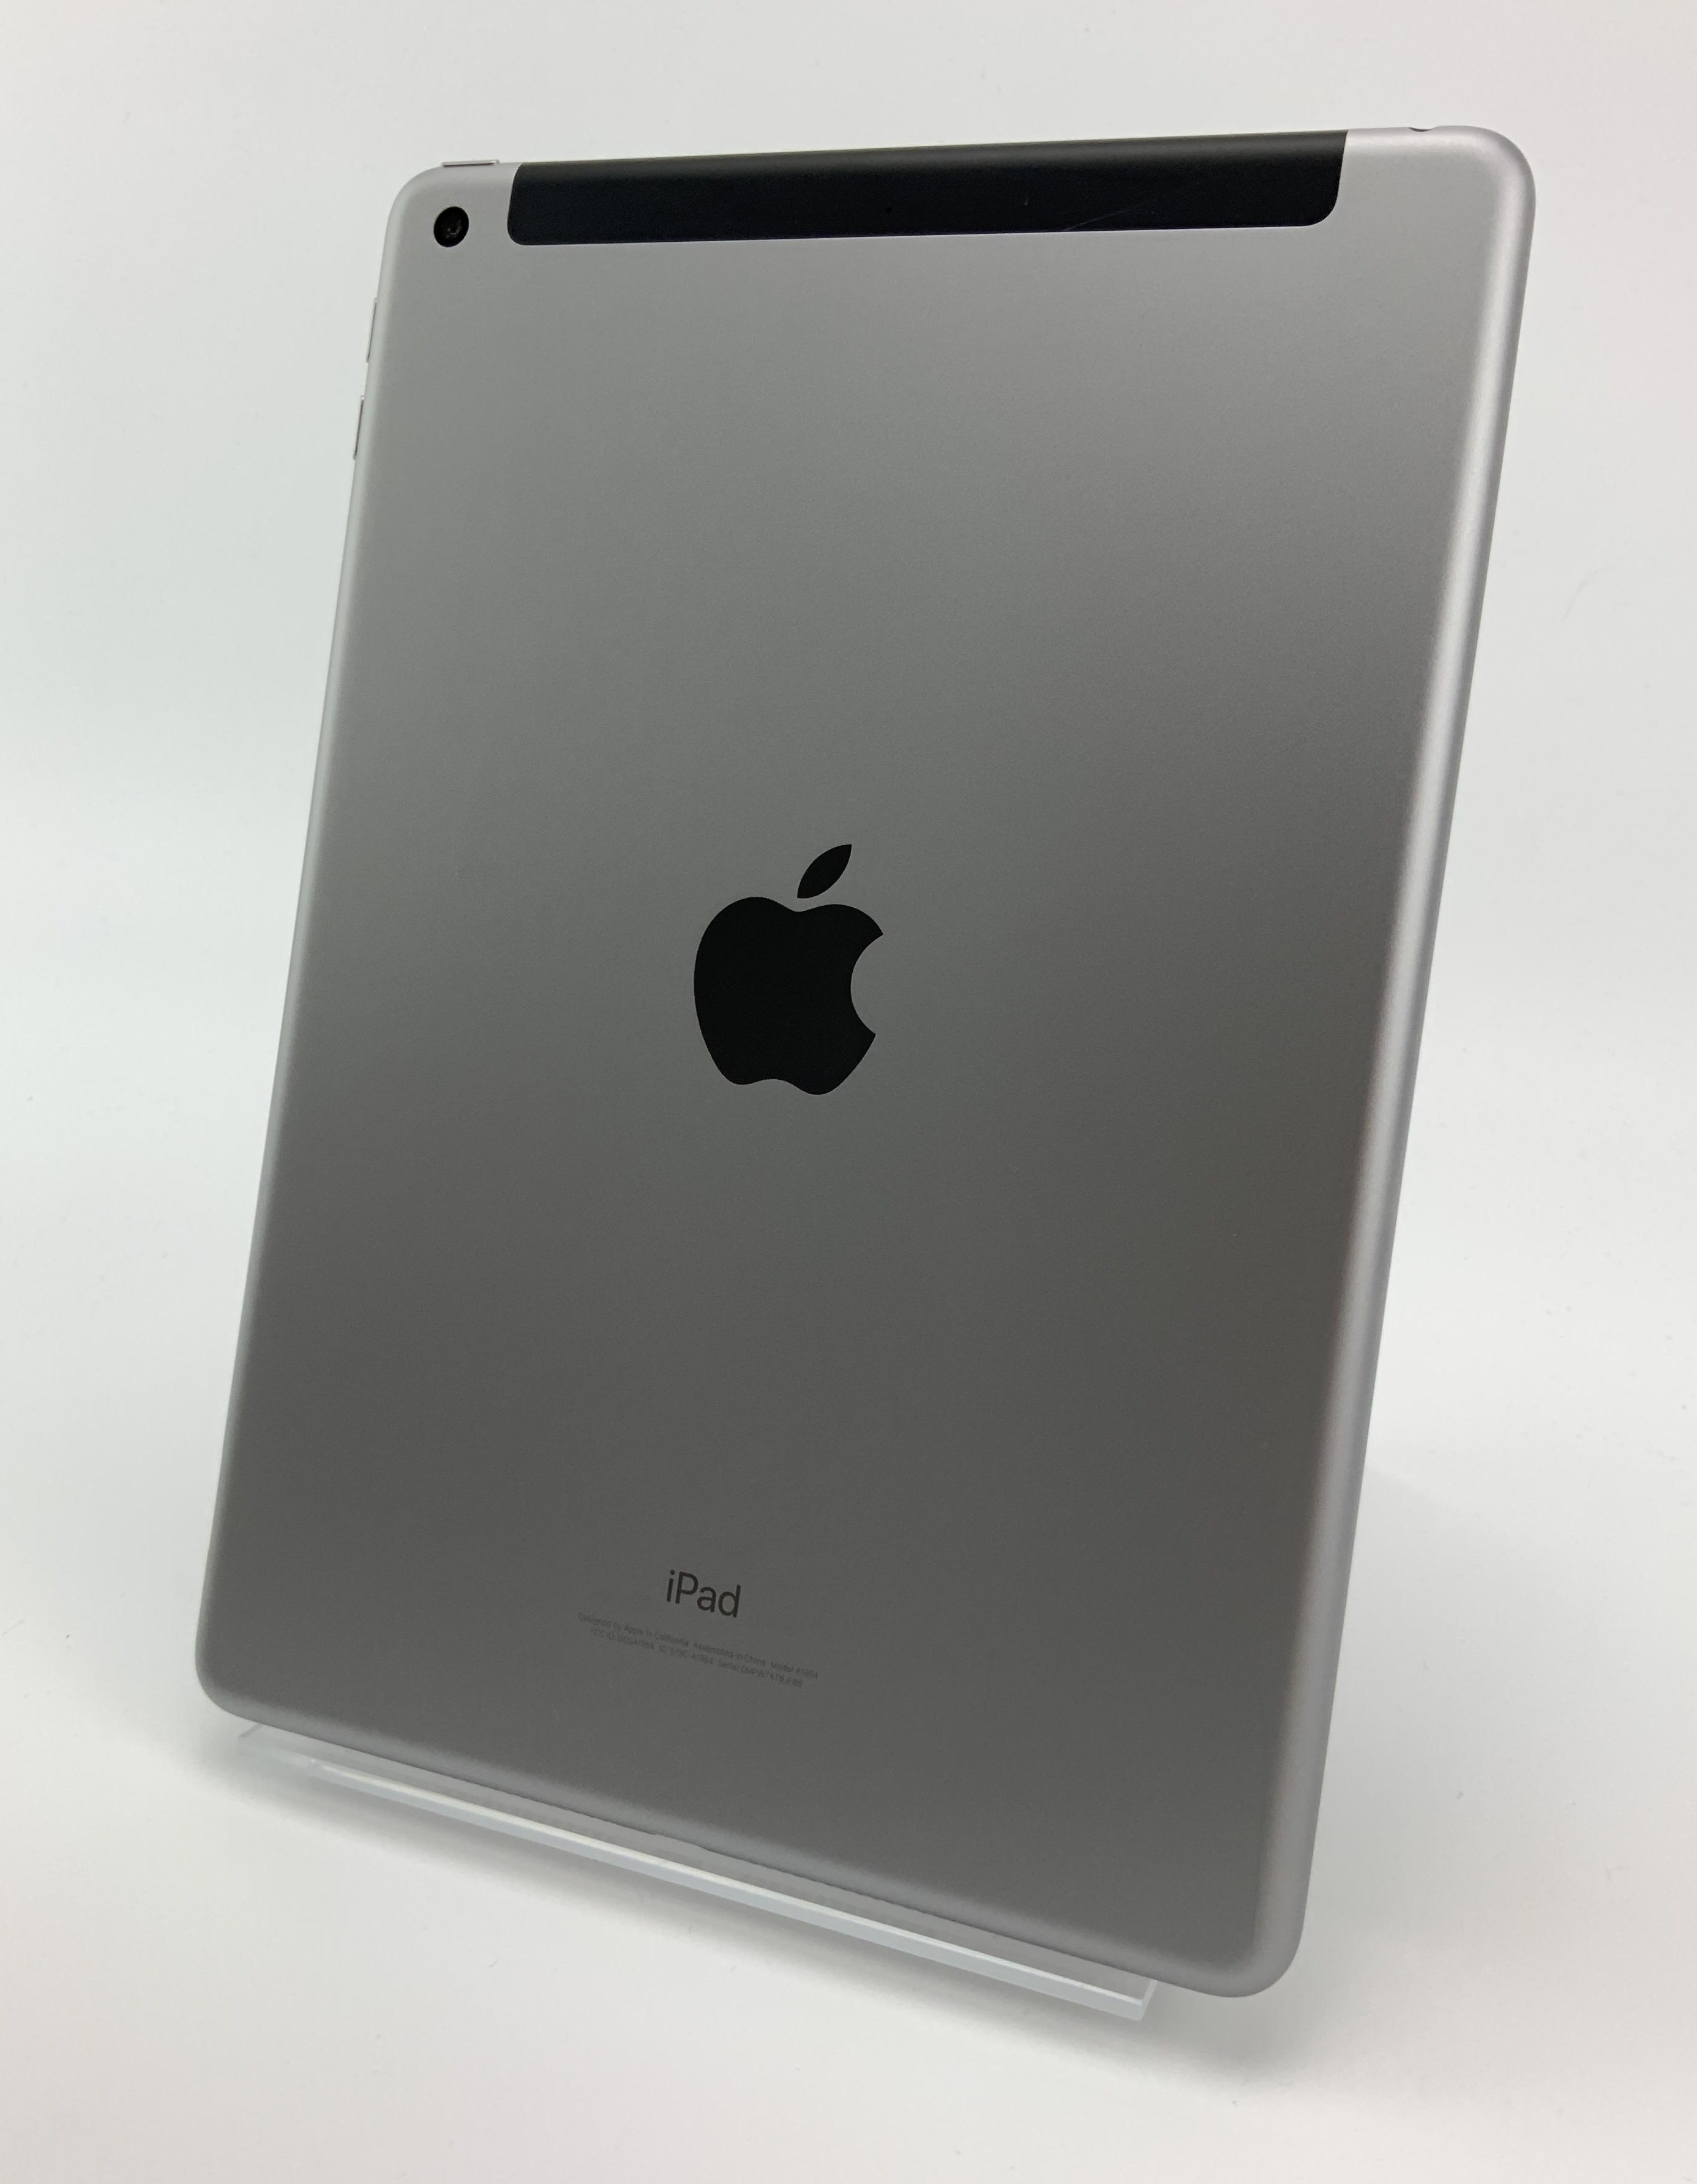 iPad 6 Wi-Fi + Cellular 32GB, 32GB, Space Gray, obraz 2